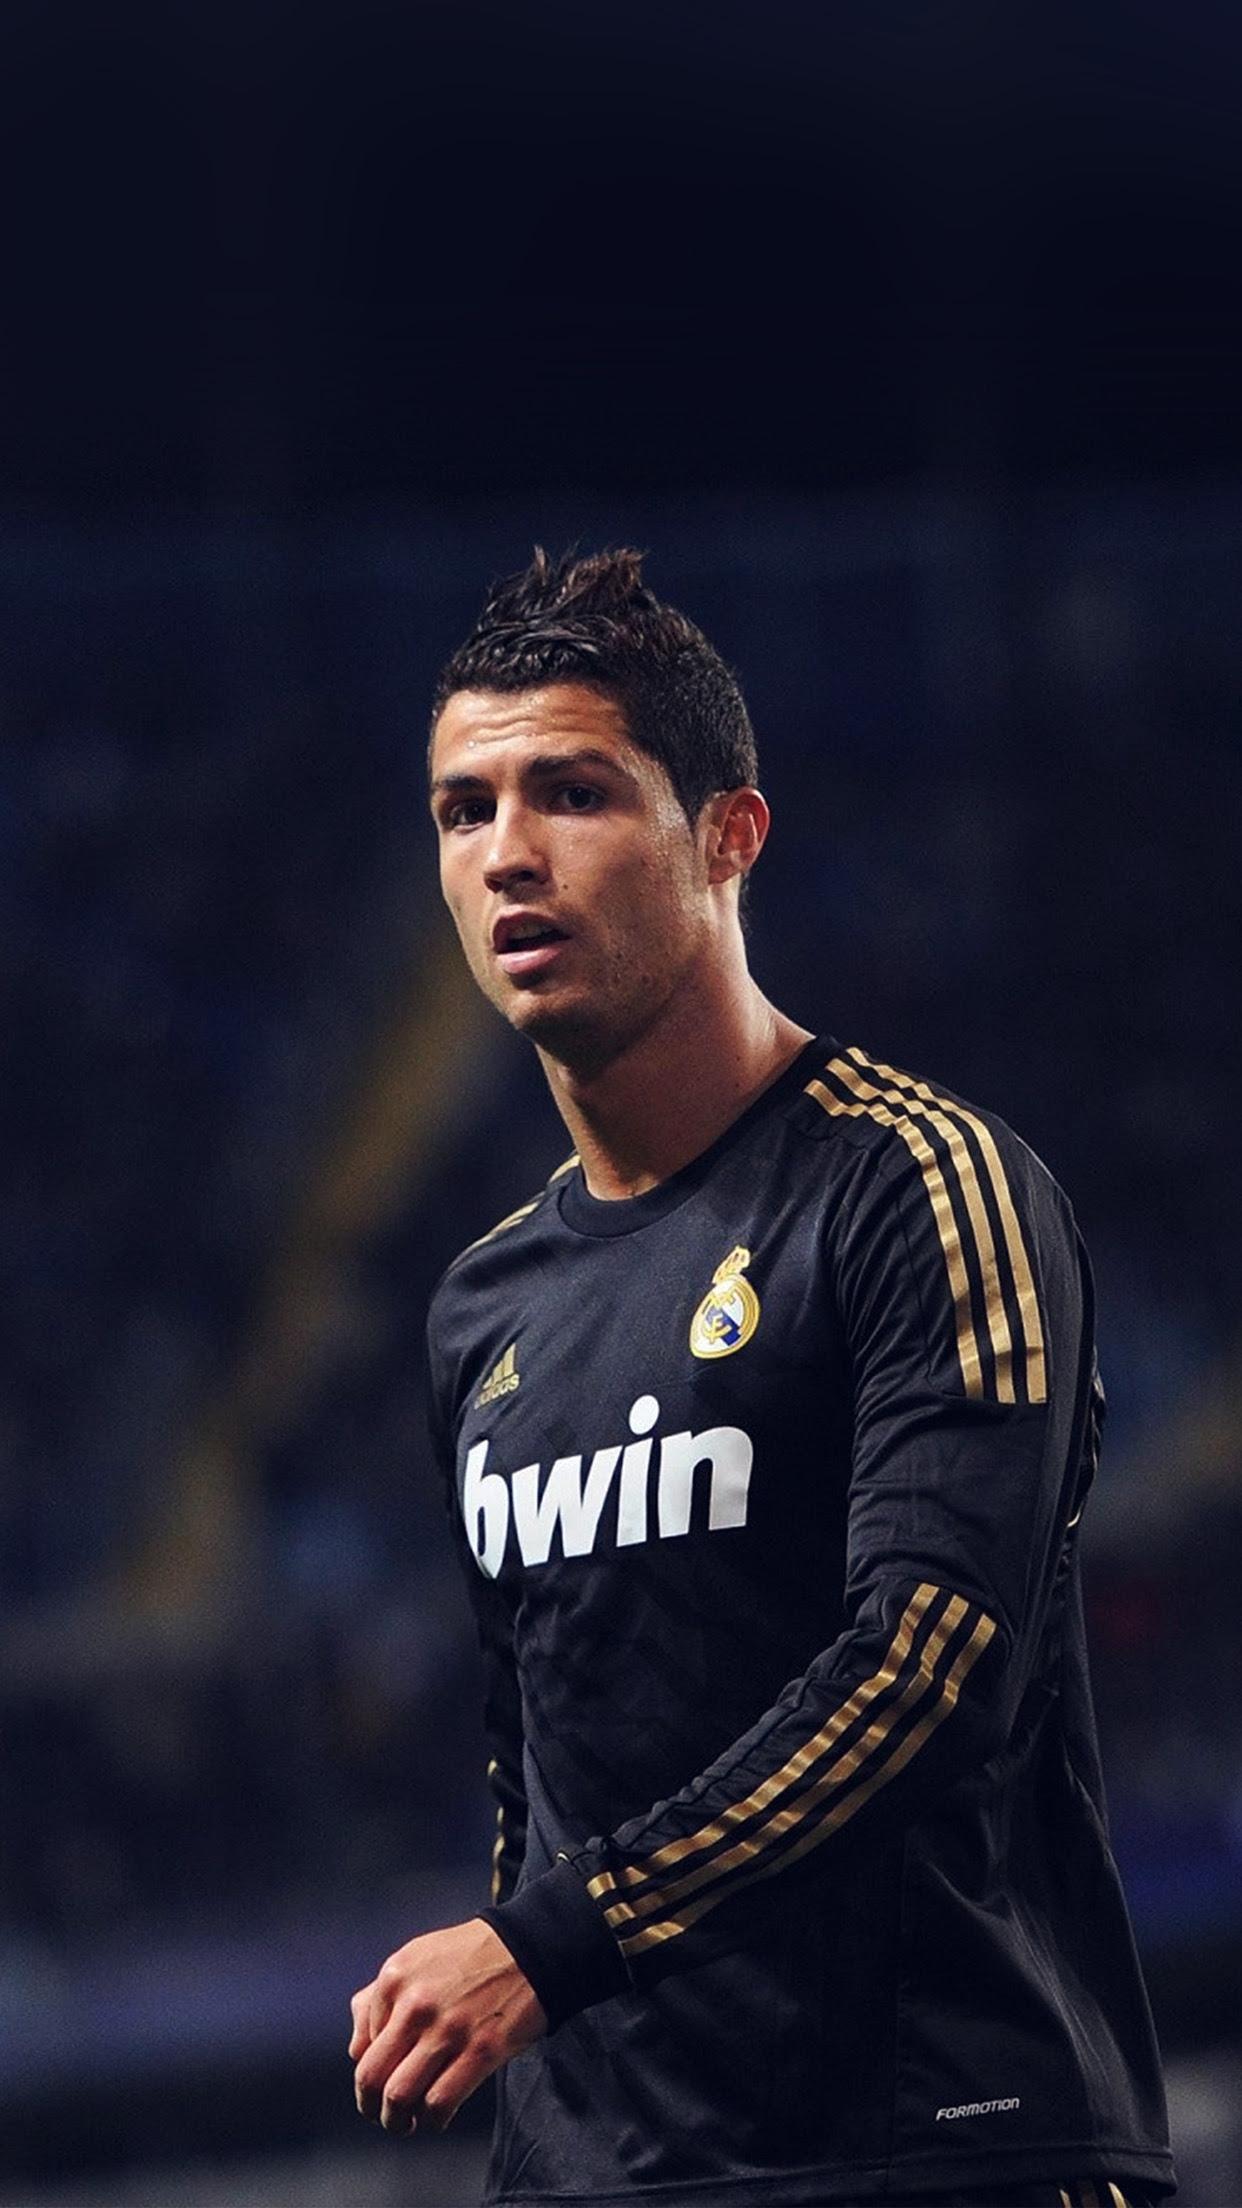 Unduh 600+ Wallpaper Apple Ronaldo HD